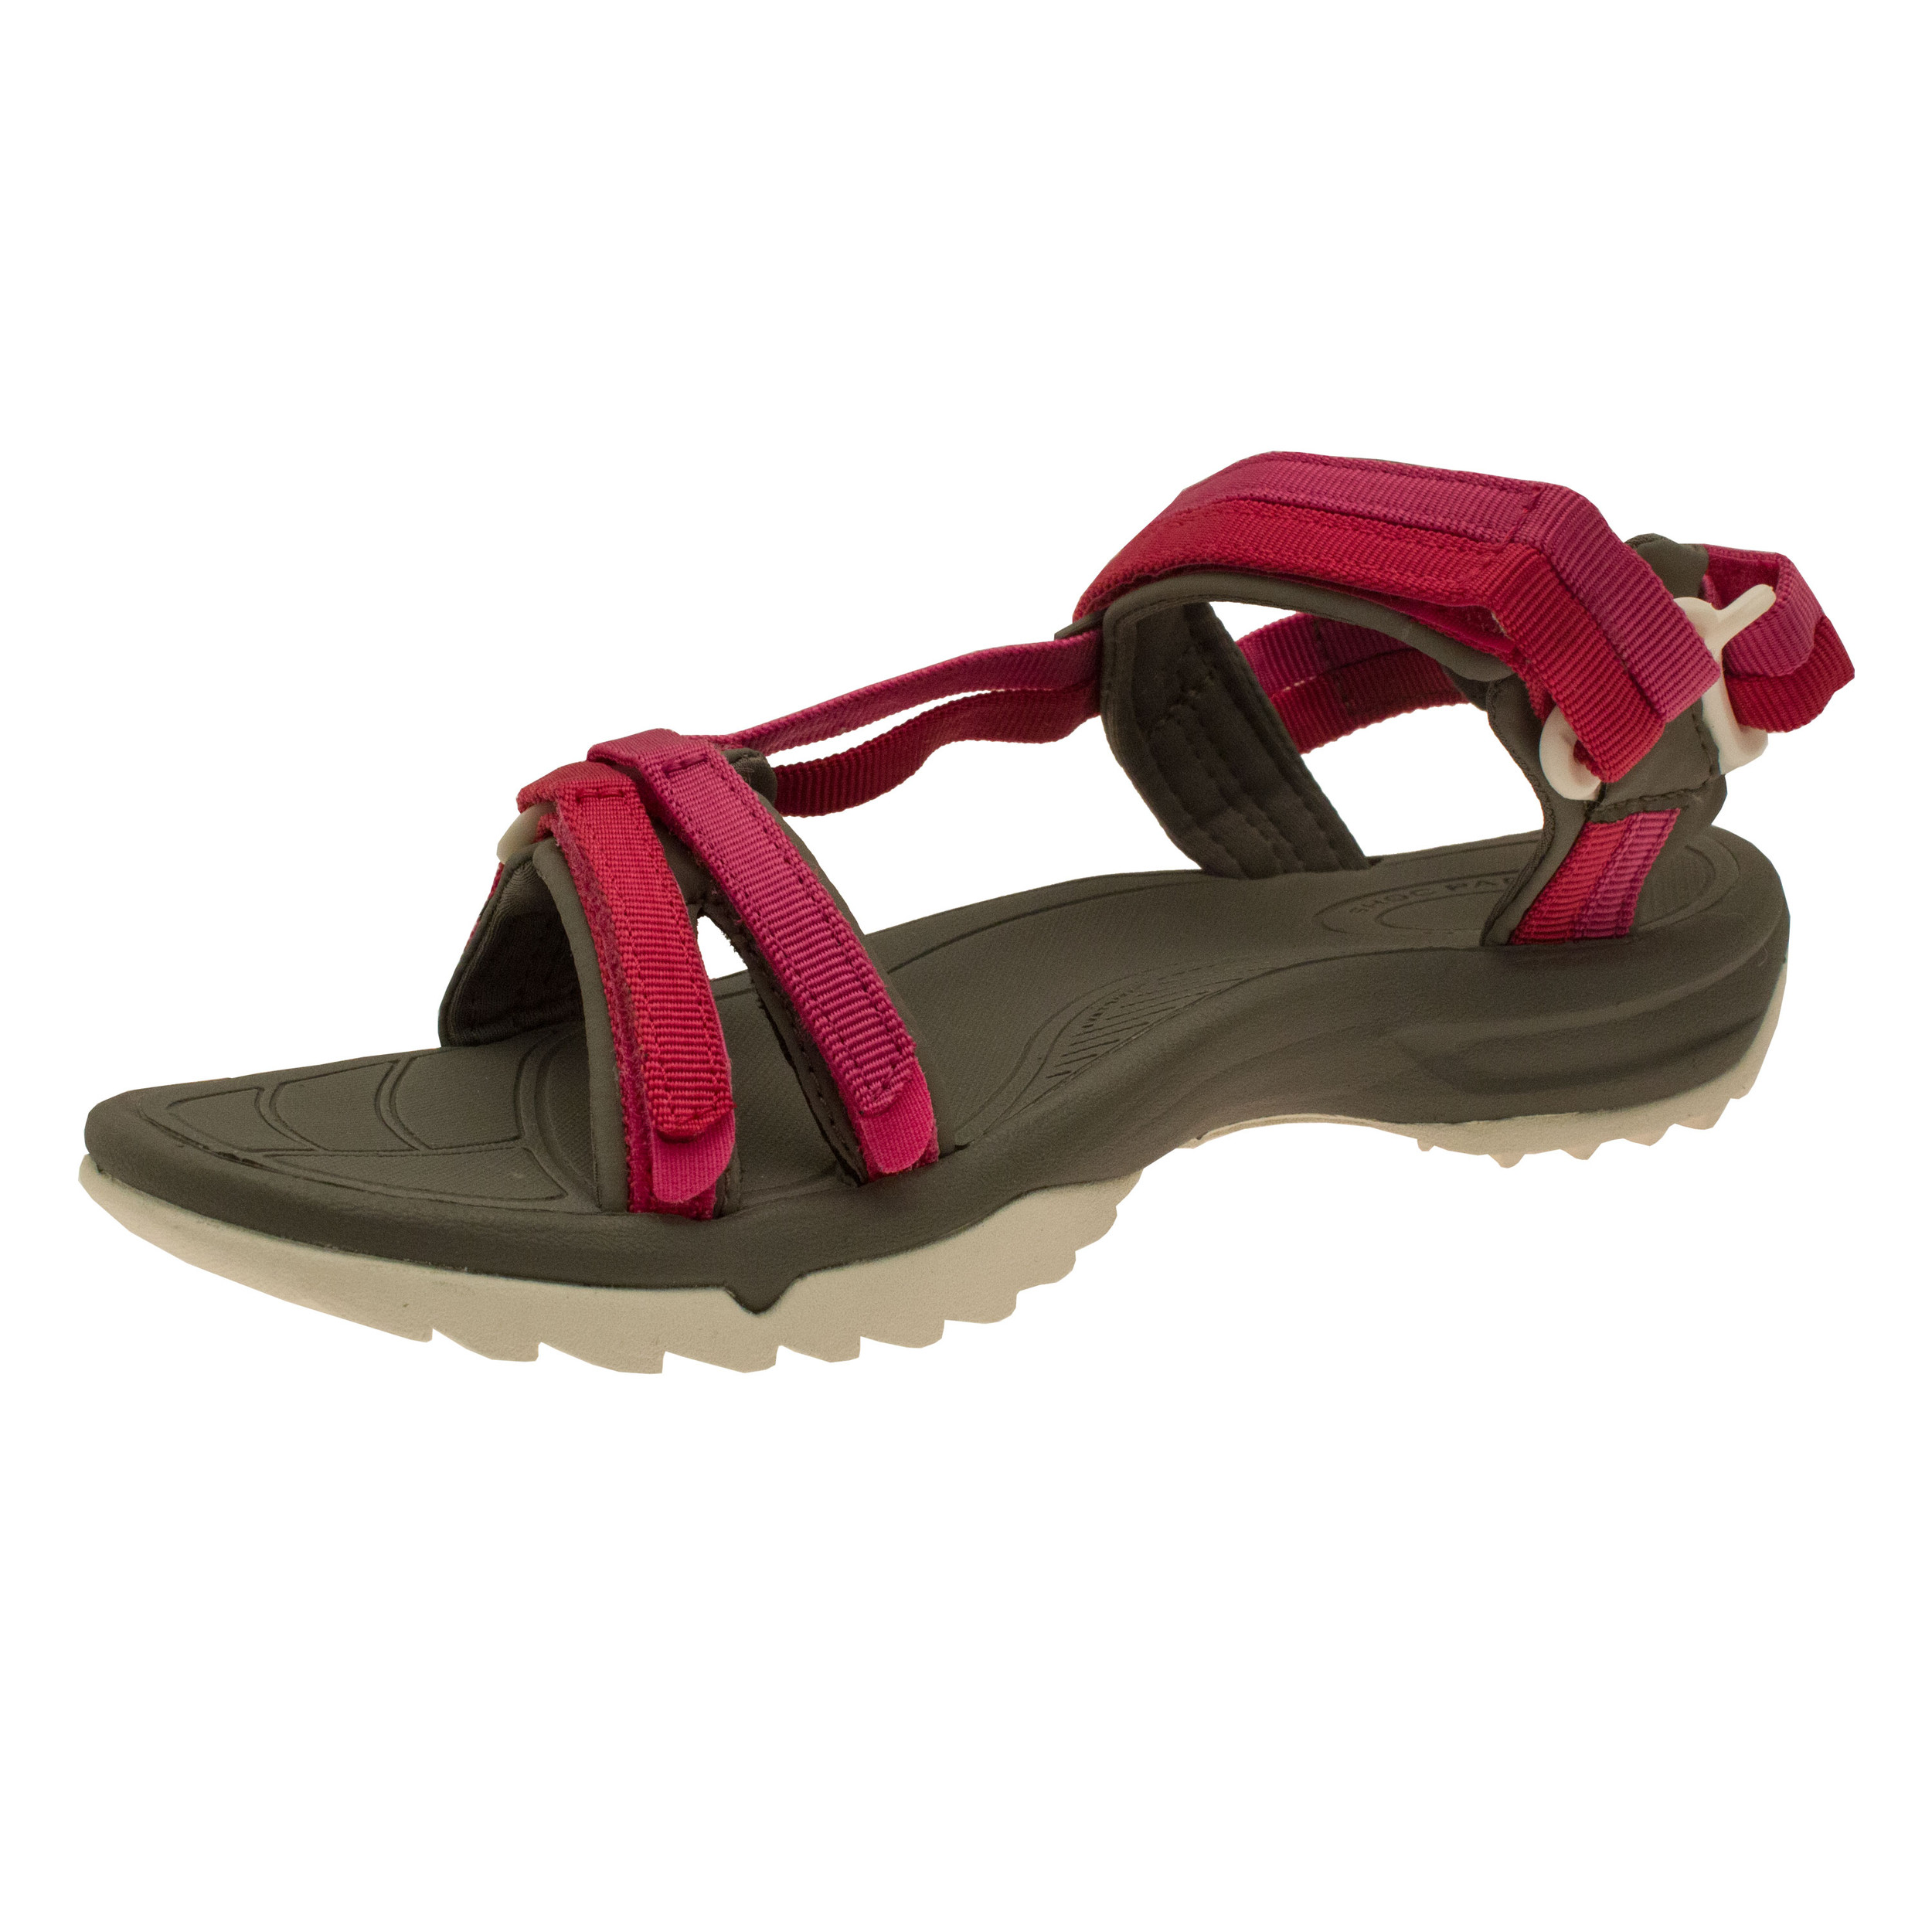 teva terra fi lite damen trekkingsandalen wanderschuhe sandalen grau rosa ebay. Black Bedroom Furniture Sets. Home Design Ideas